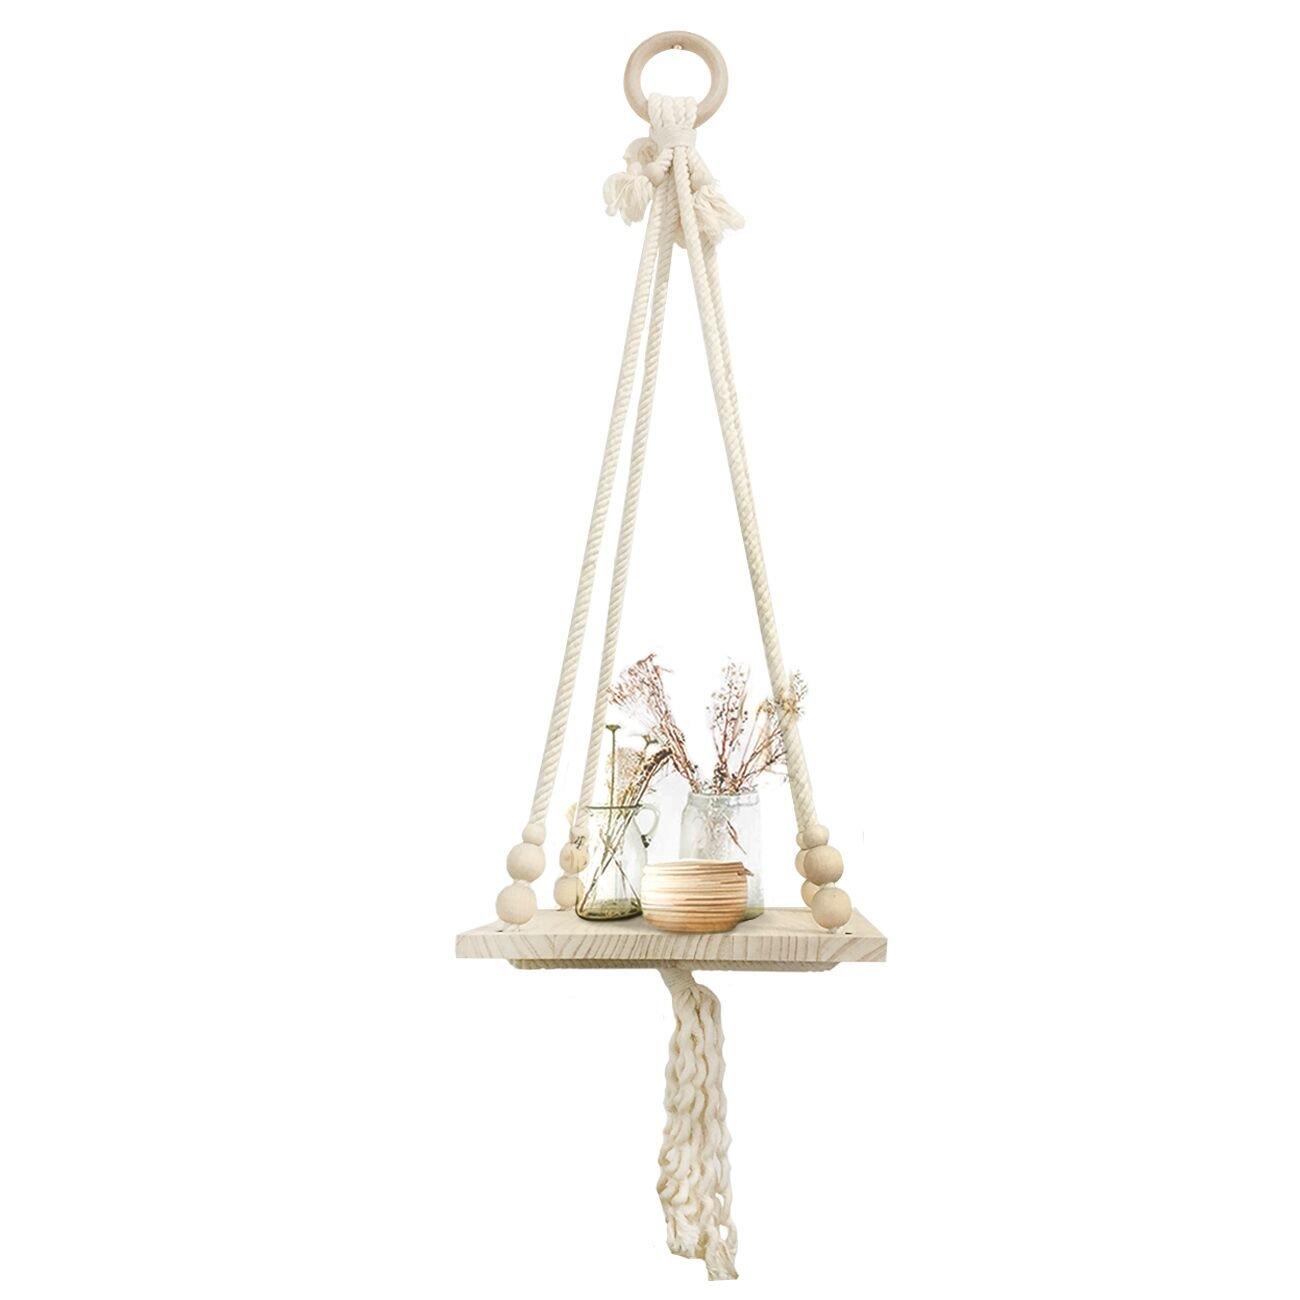 Macrame Shelf Hanging Plant Hanger - Display Wall Hanging Shelf Pot Holder Long Tassel with Bead Boho Decor Garden Home Office Decor Round Wooden Hanging Ring